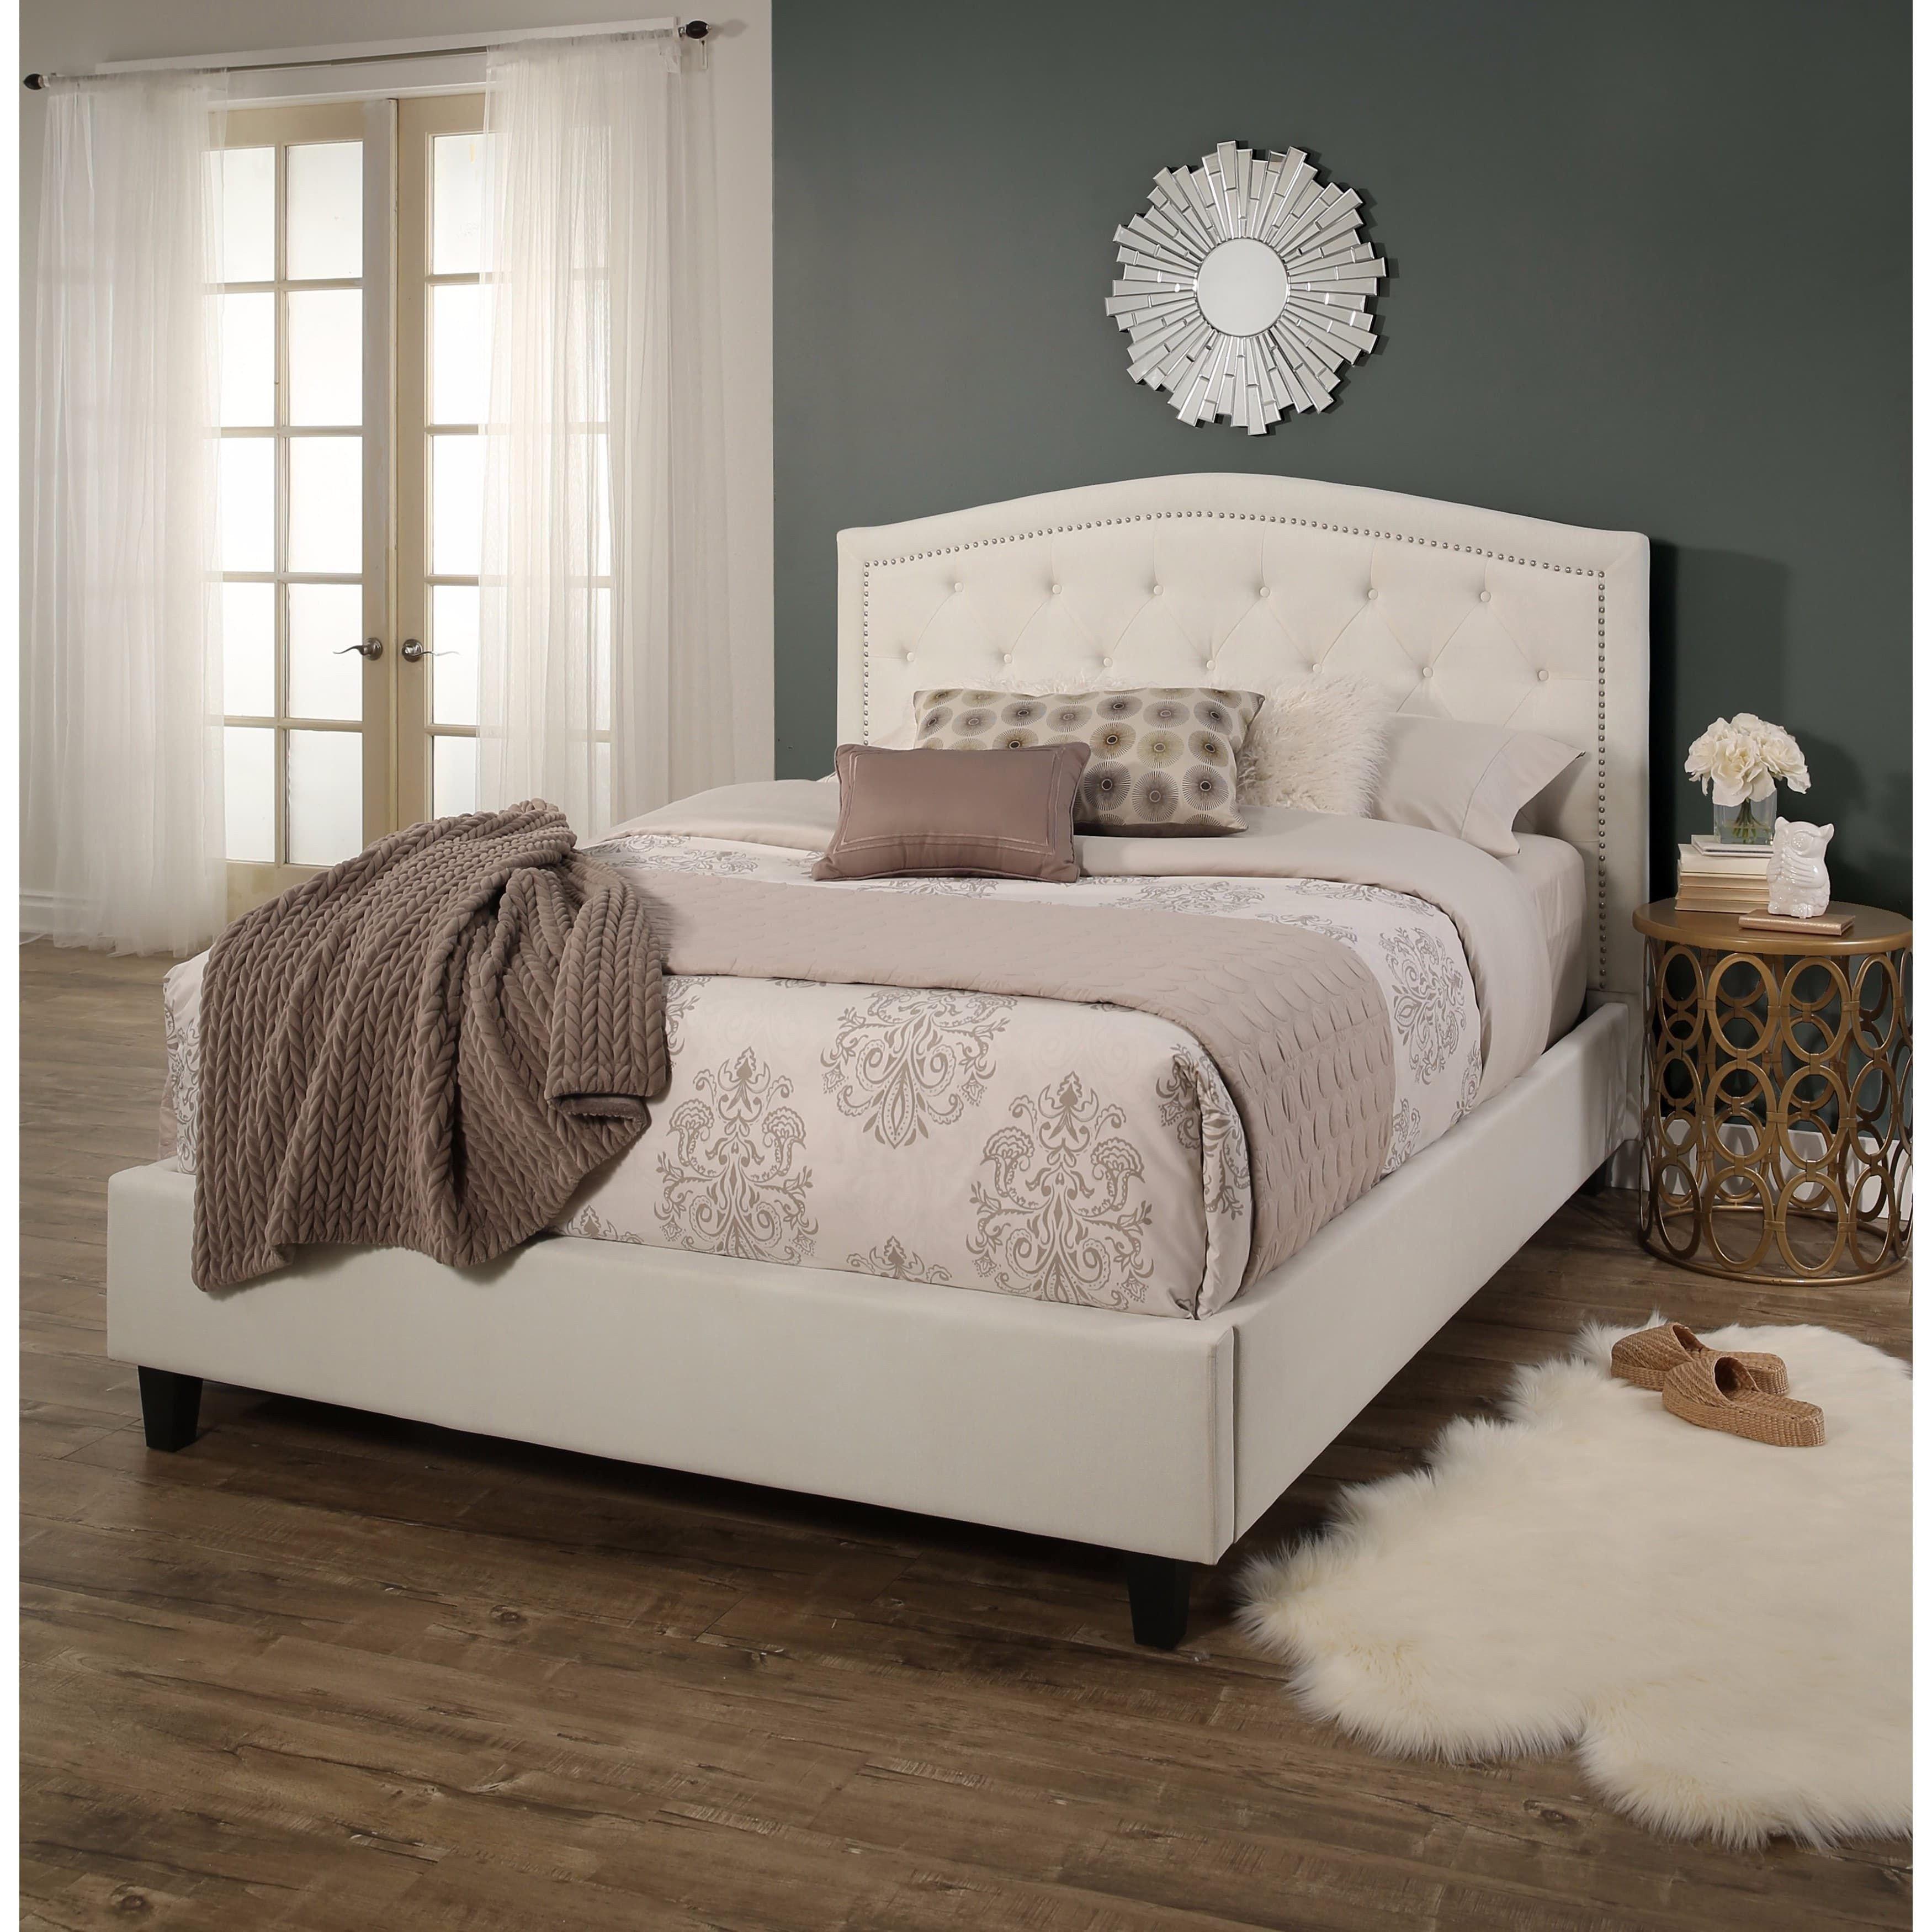 Queen Platform Bedroom Set Elegant Virgil Upholstered Tufted Queen Bed by Christopher Knight